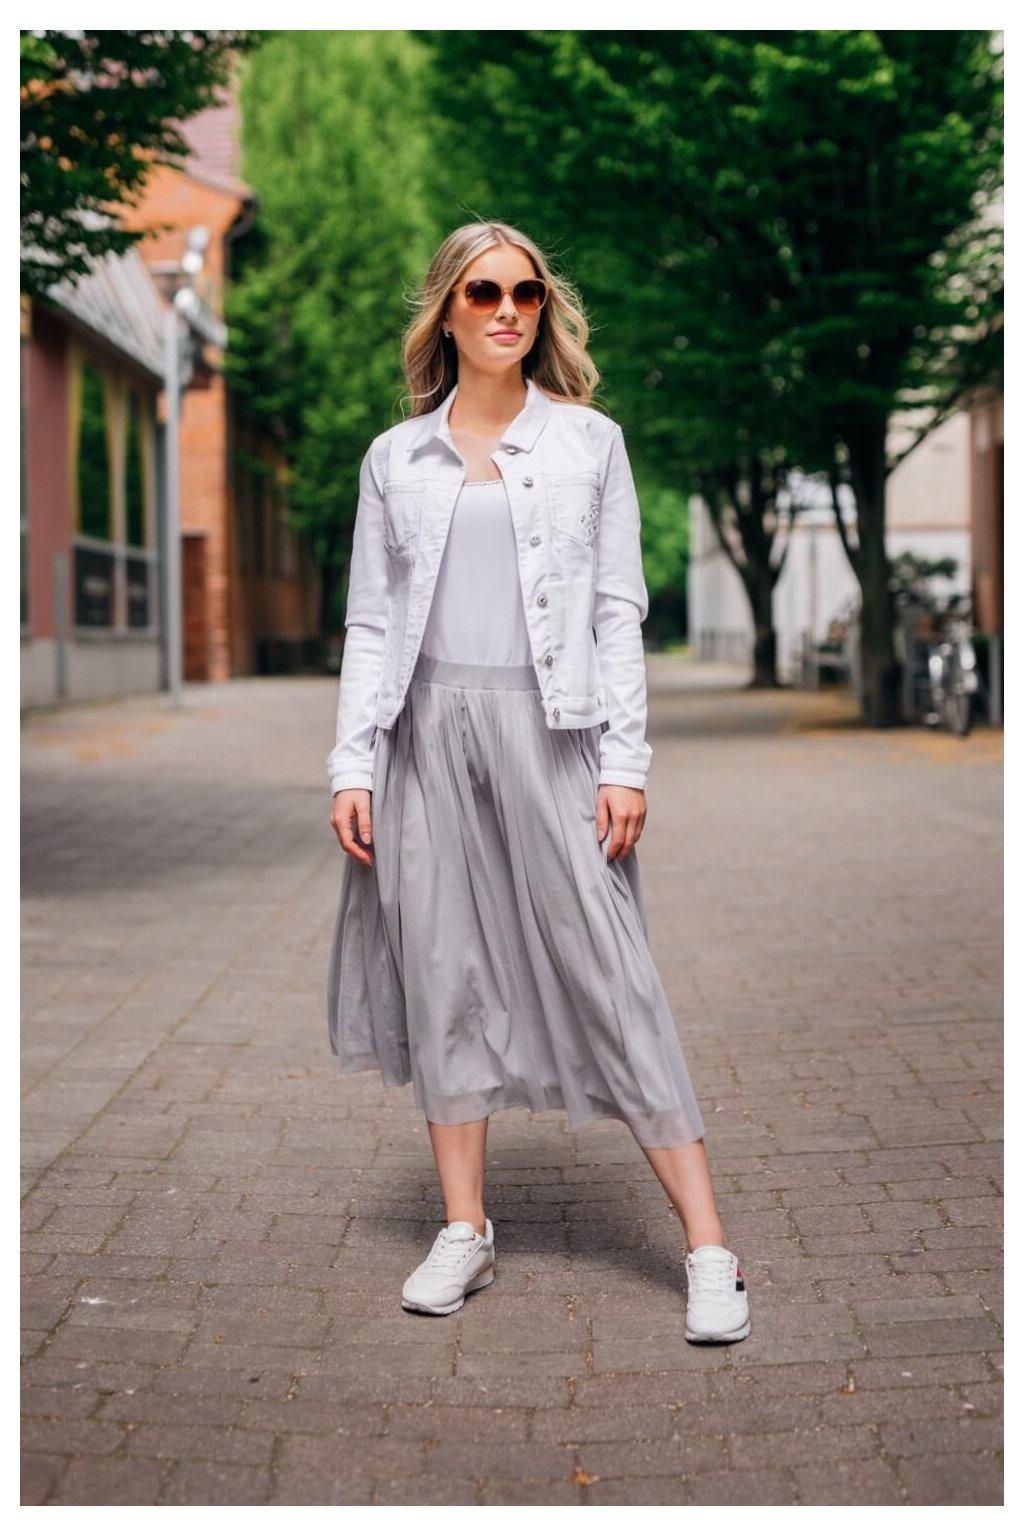 dámska tylová sukňa